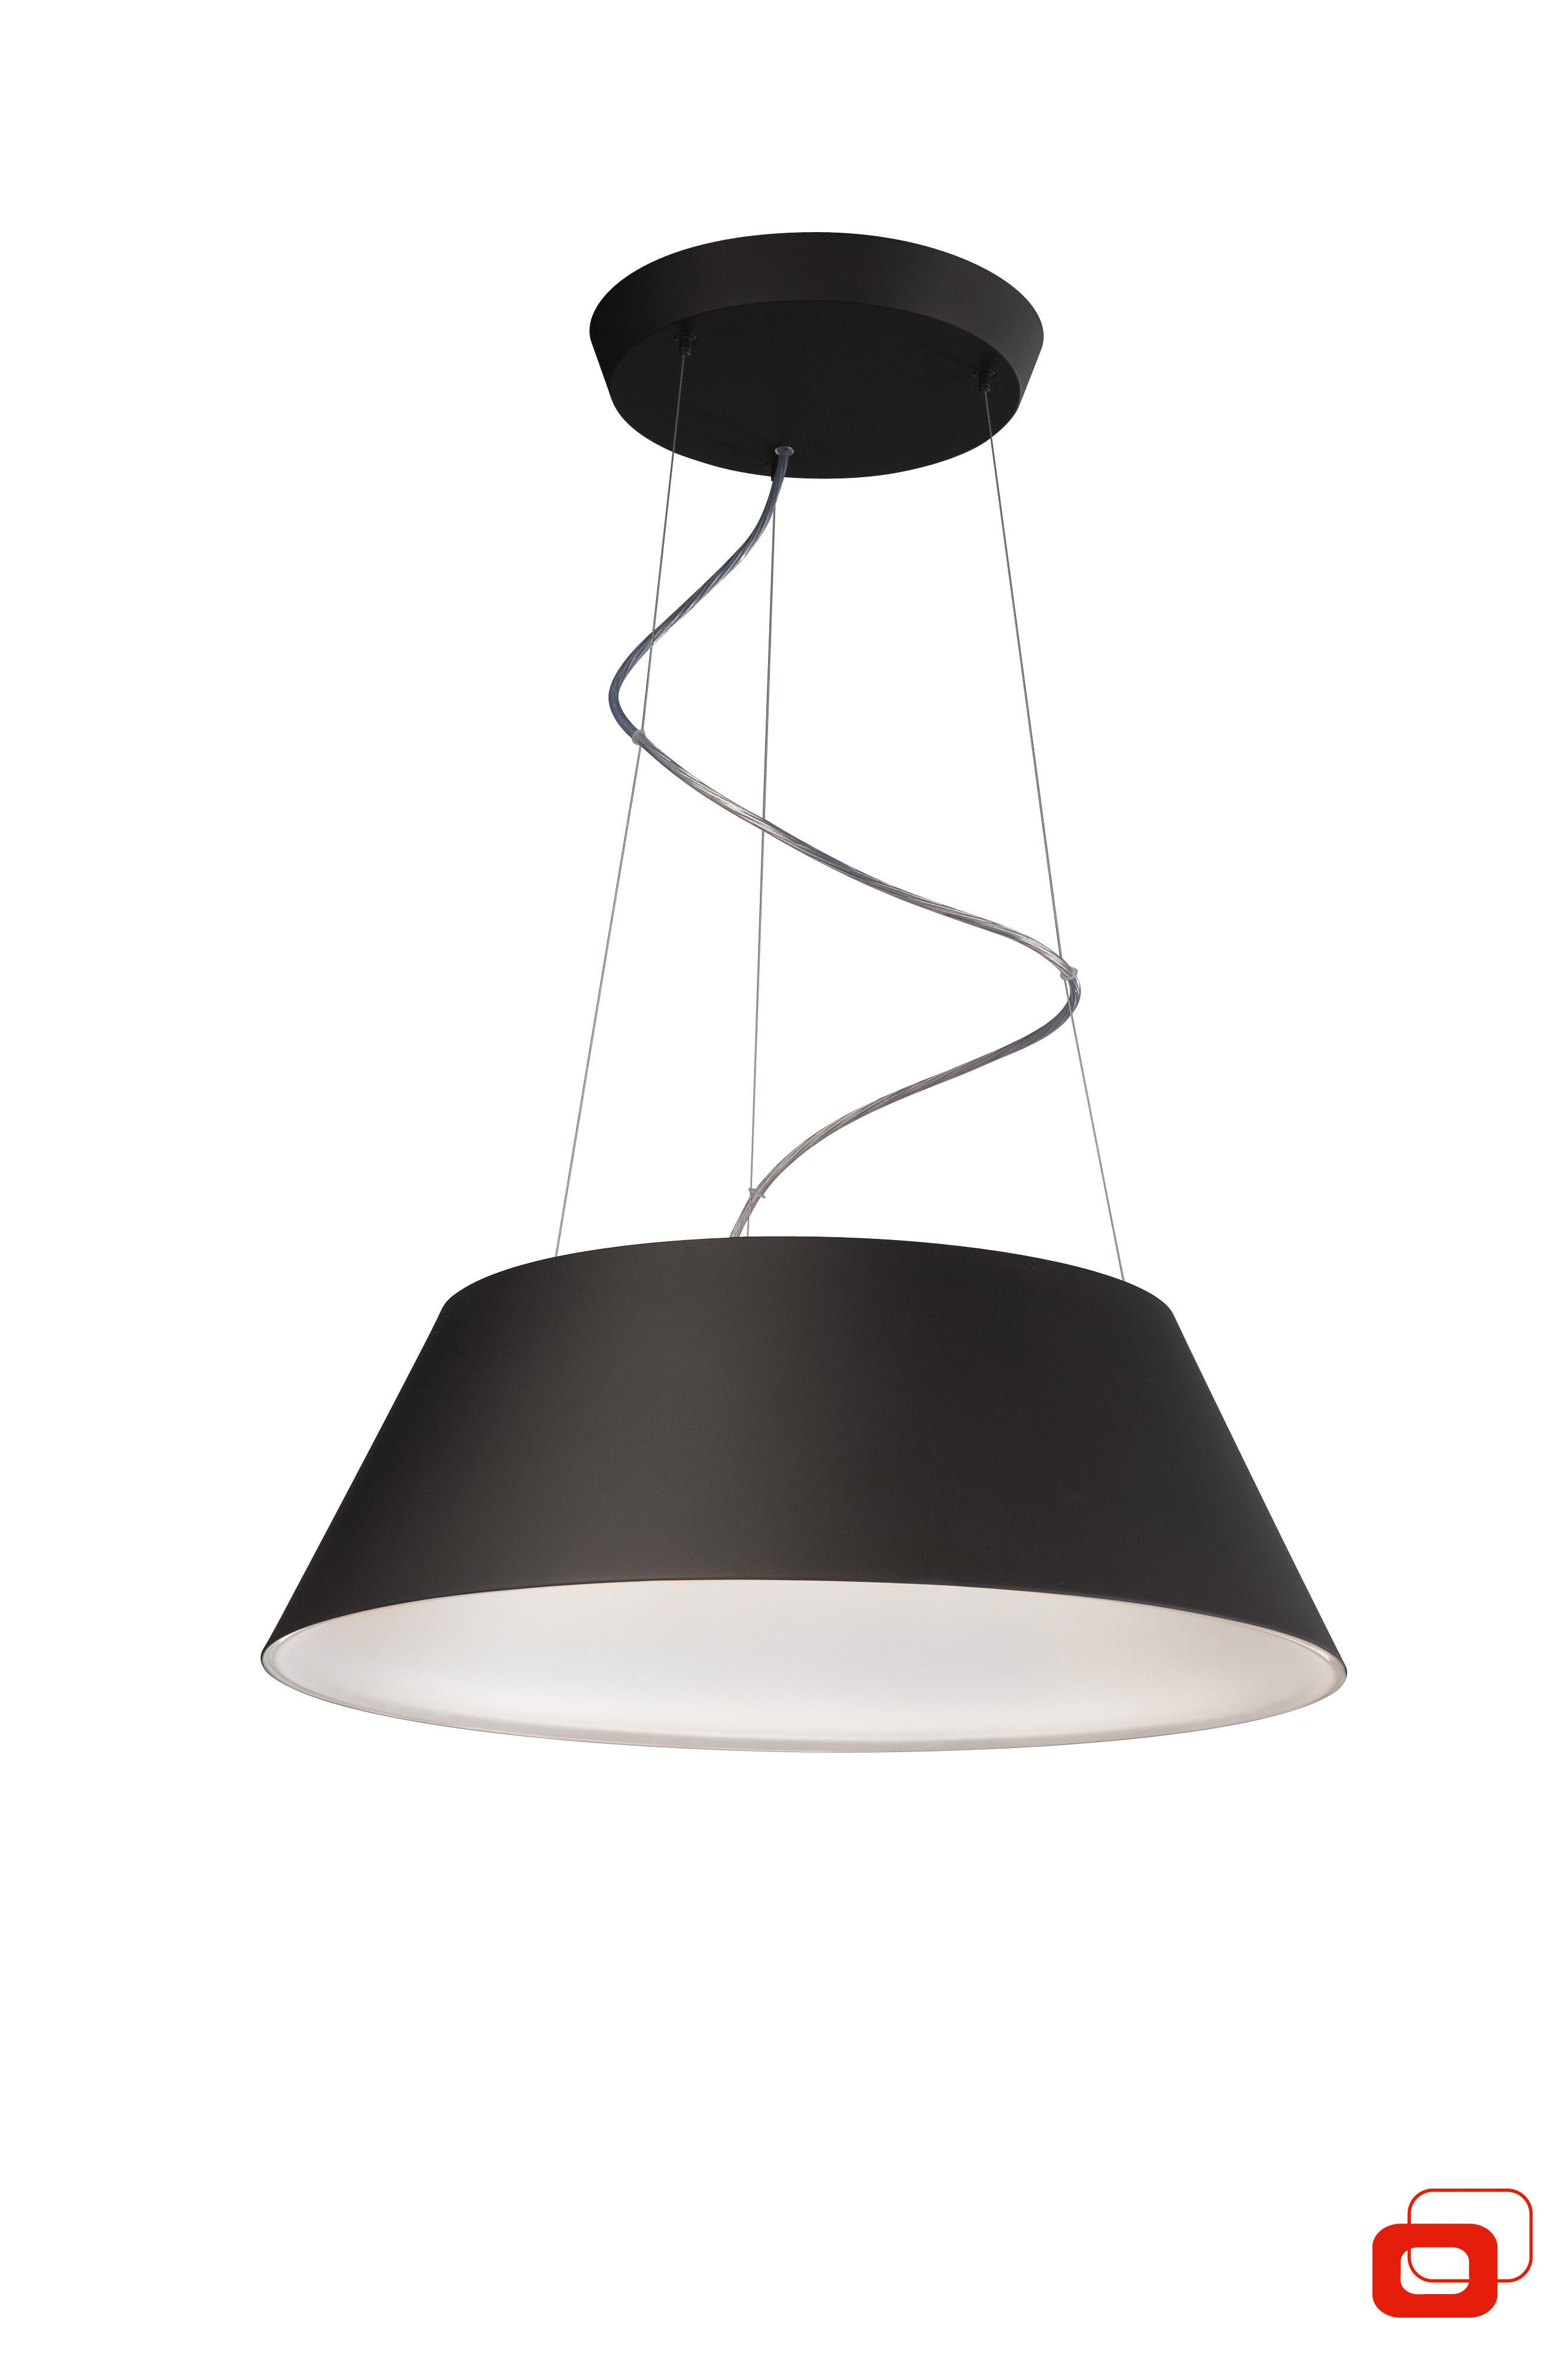 philips led leuchten f r den wohnraum. Black Bedroom Furniture Sets. Home Design Ideas